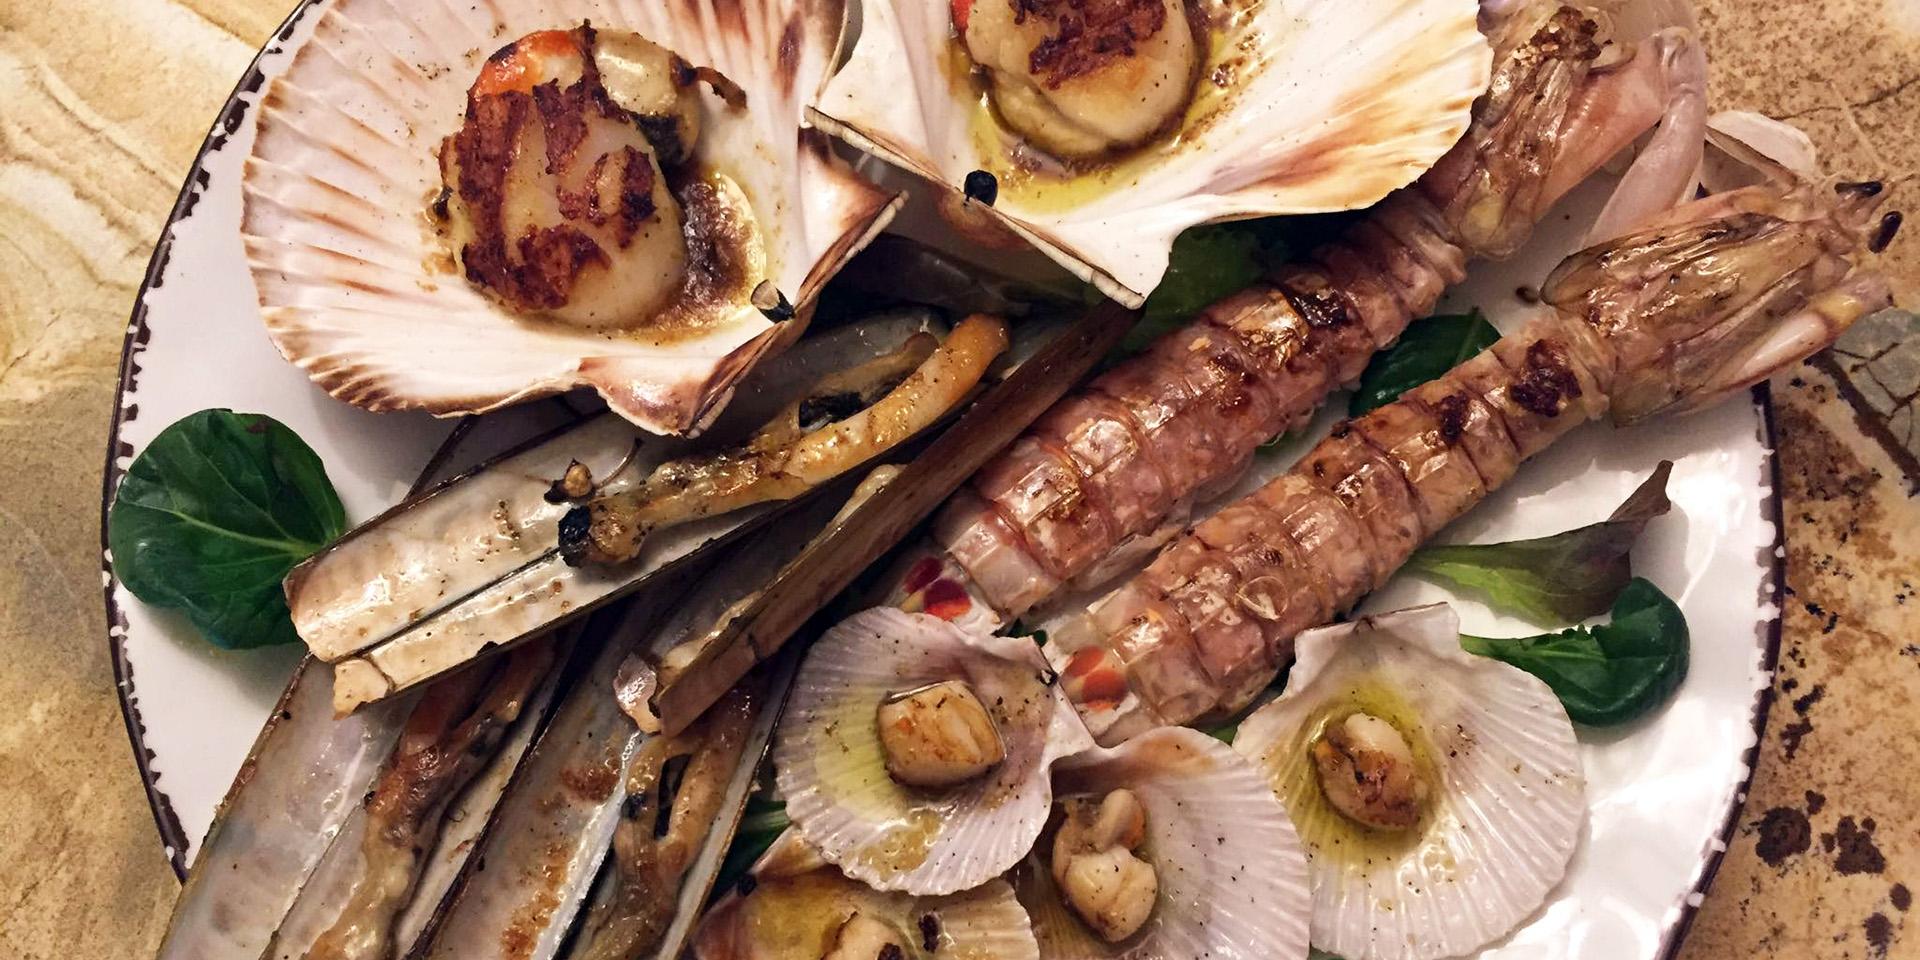 Vini da Pinto - Rialto- menu razor clams scallops mantis prawns